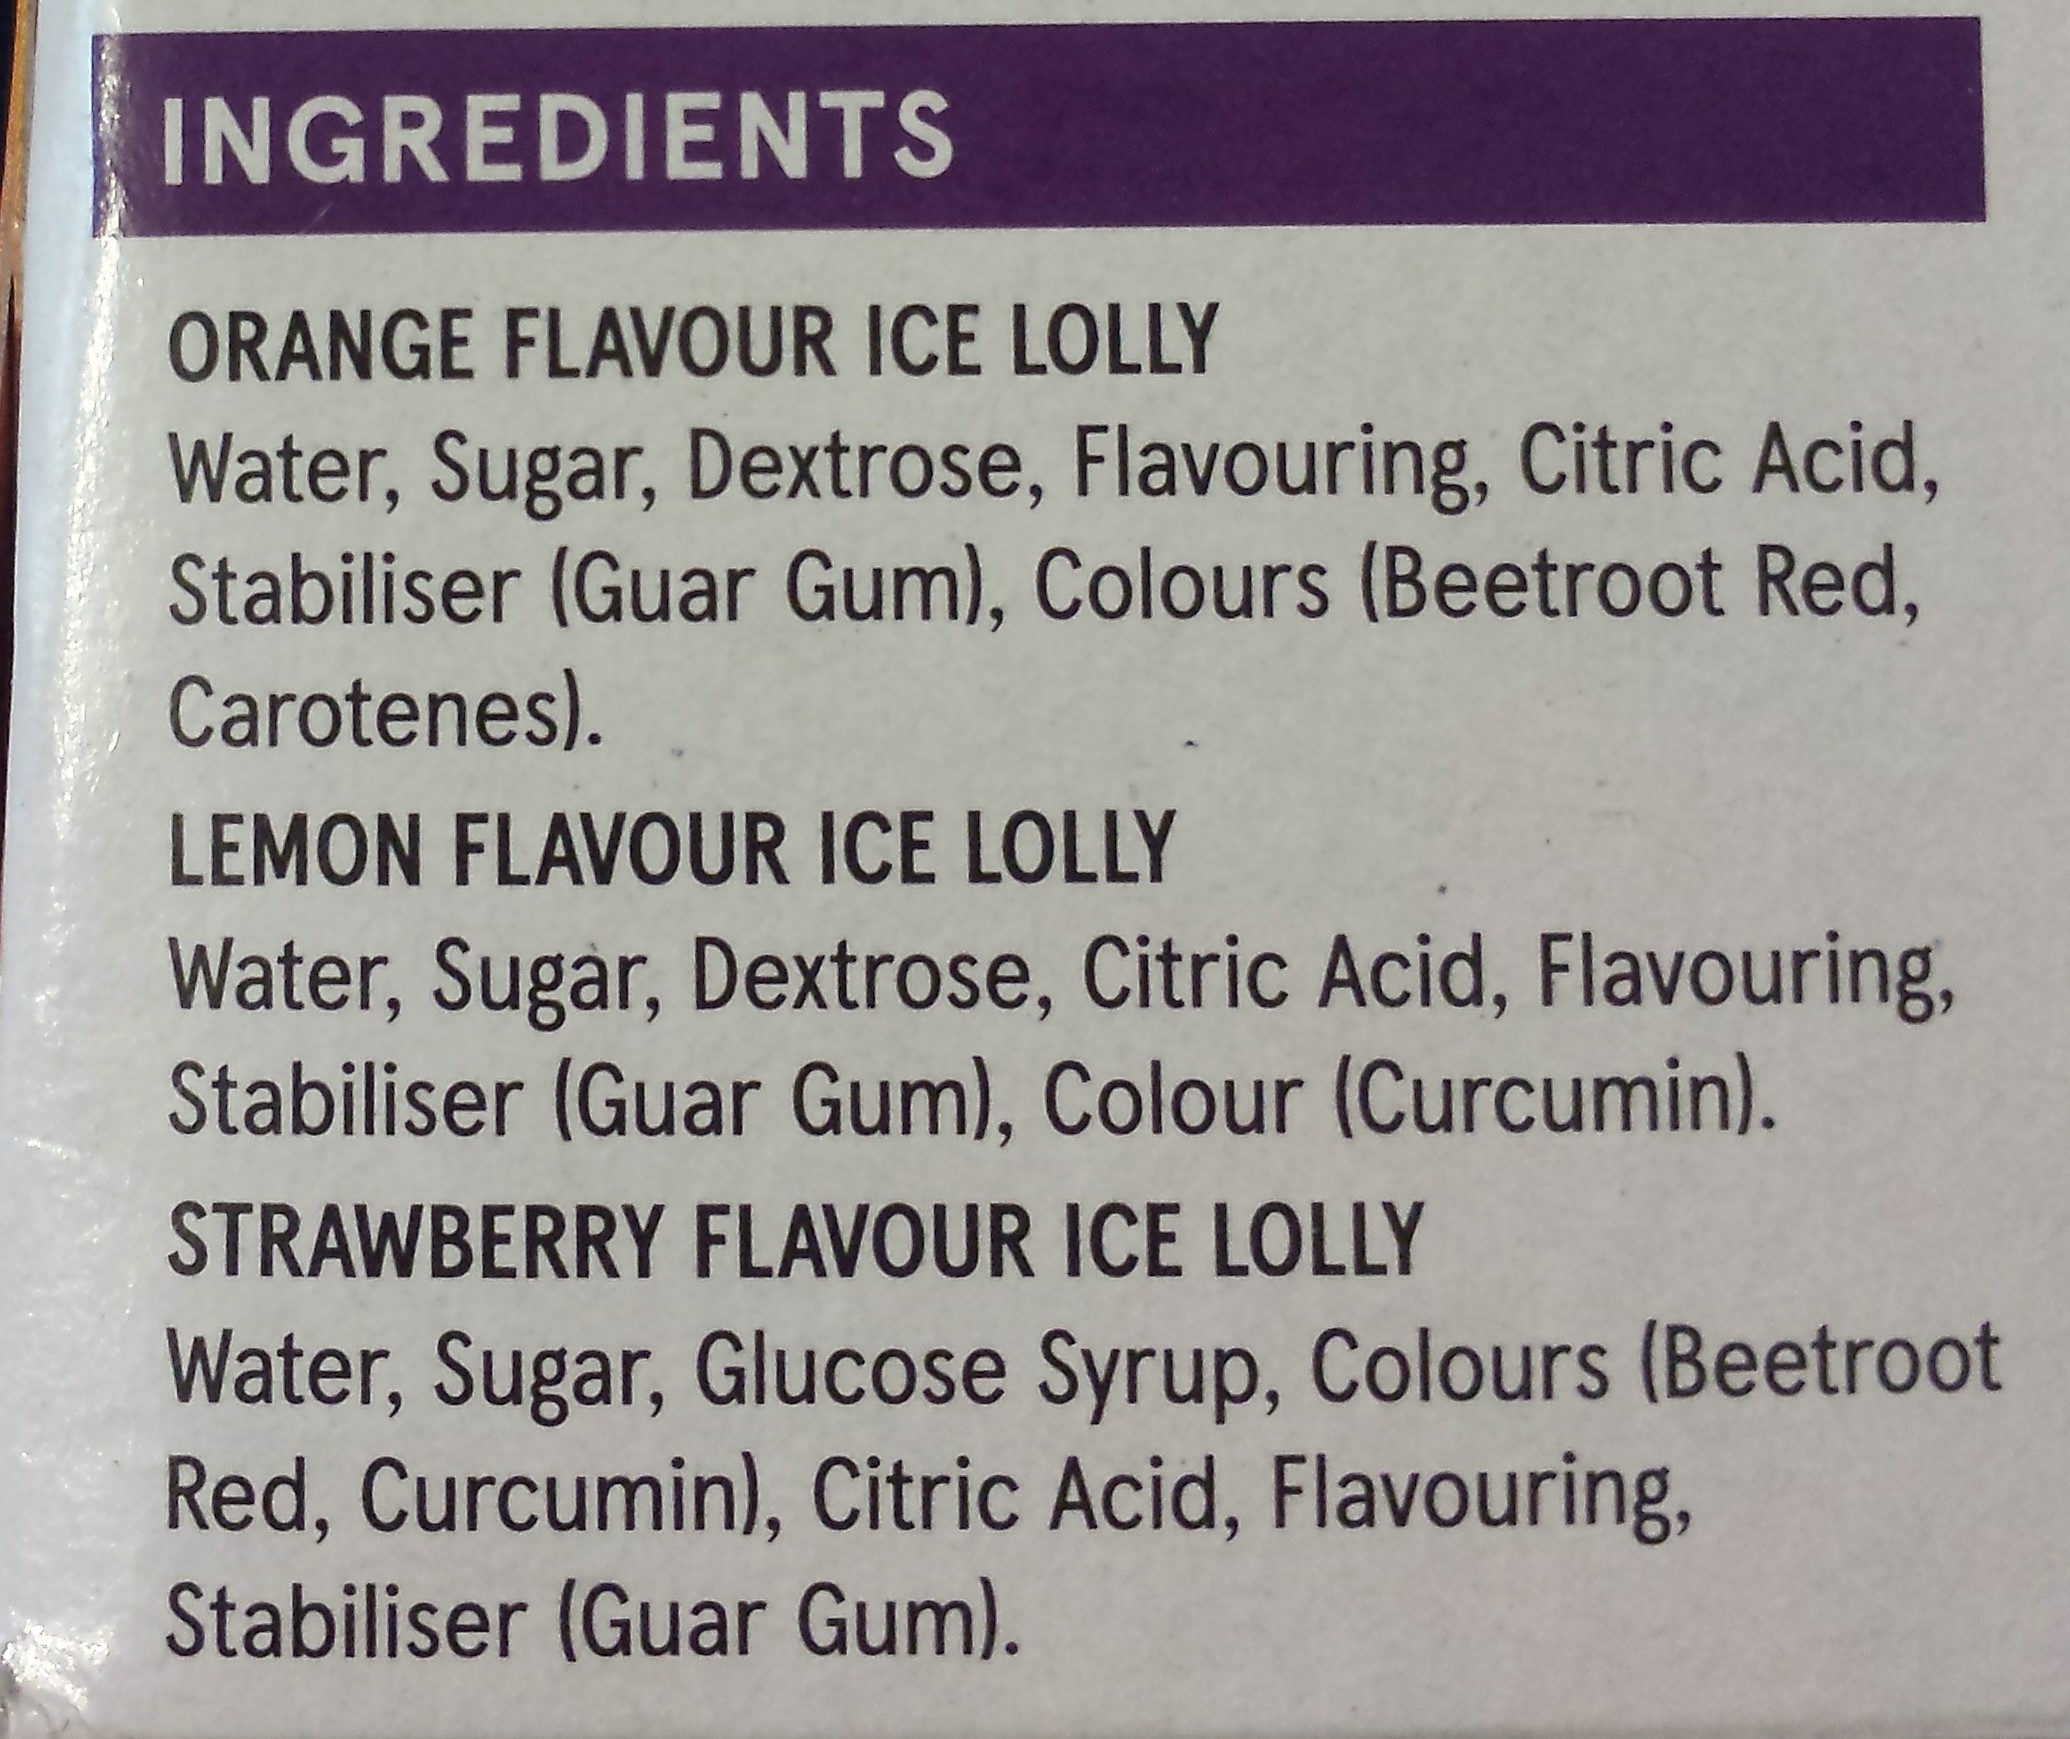 Fruit Flavoured Ice Lollies - Ingrédients